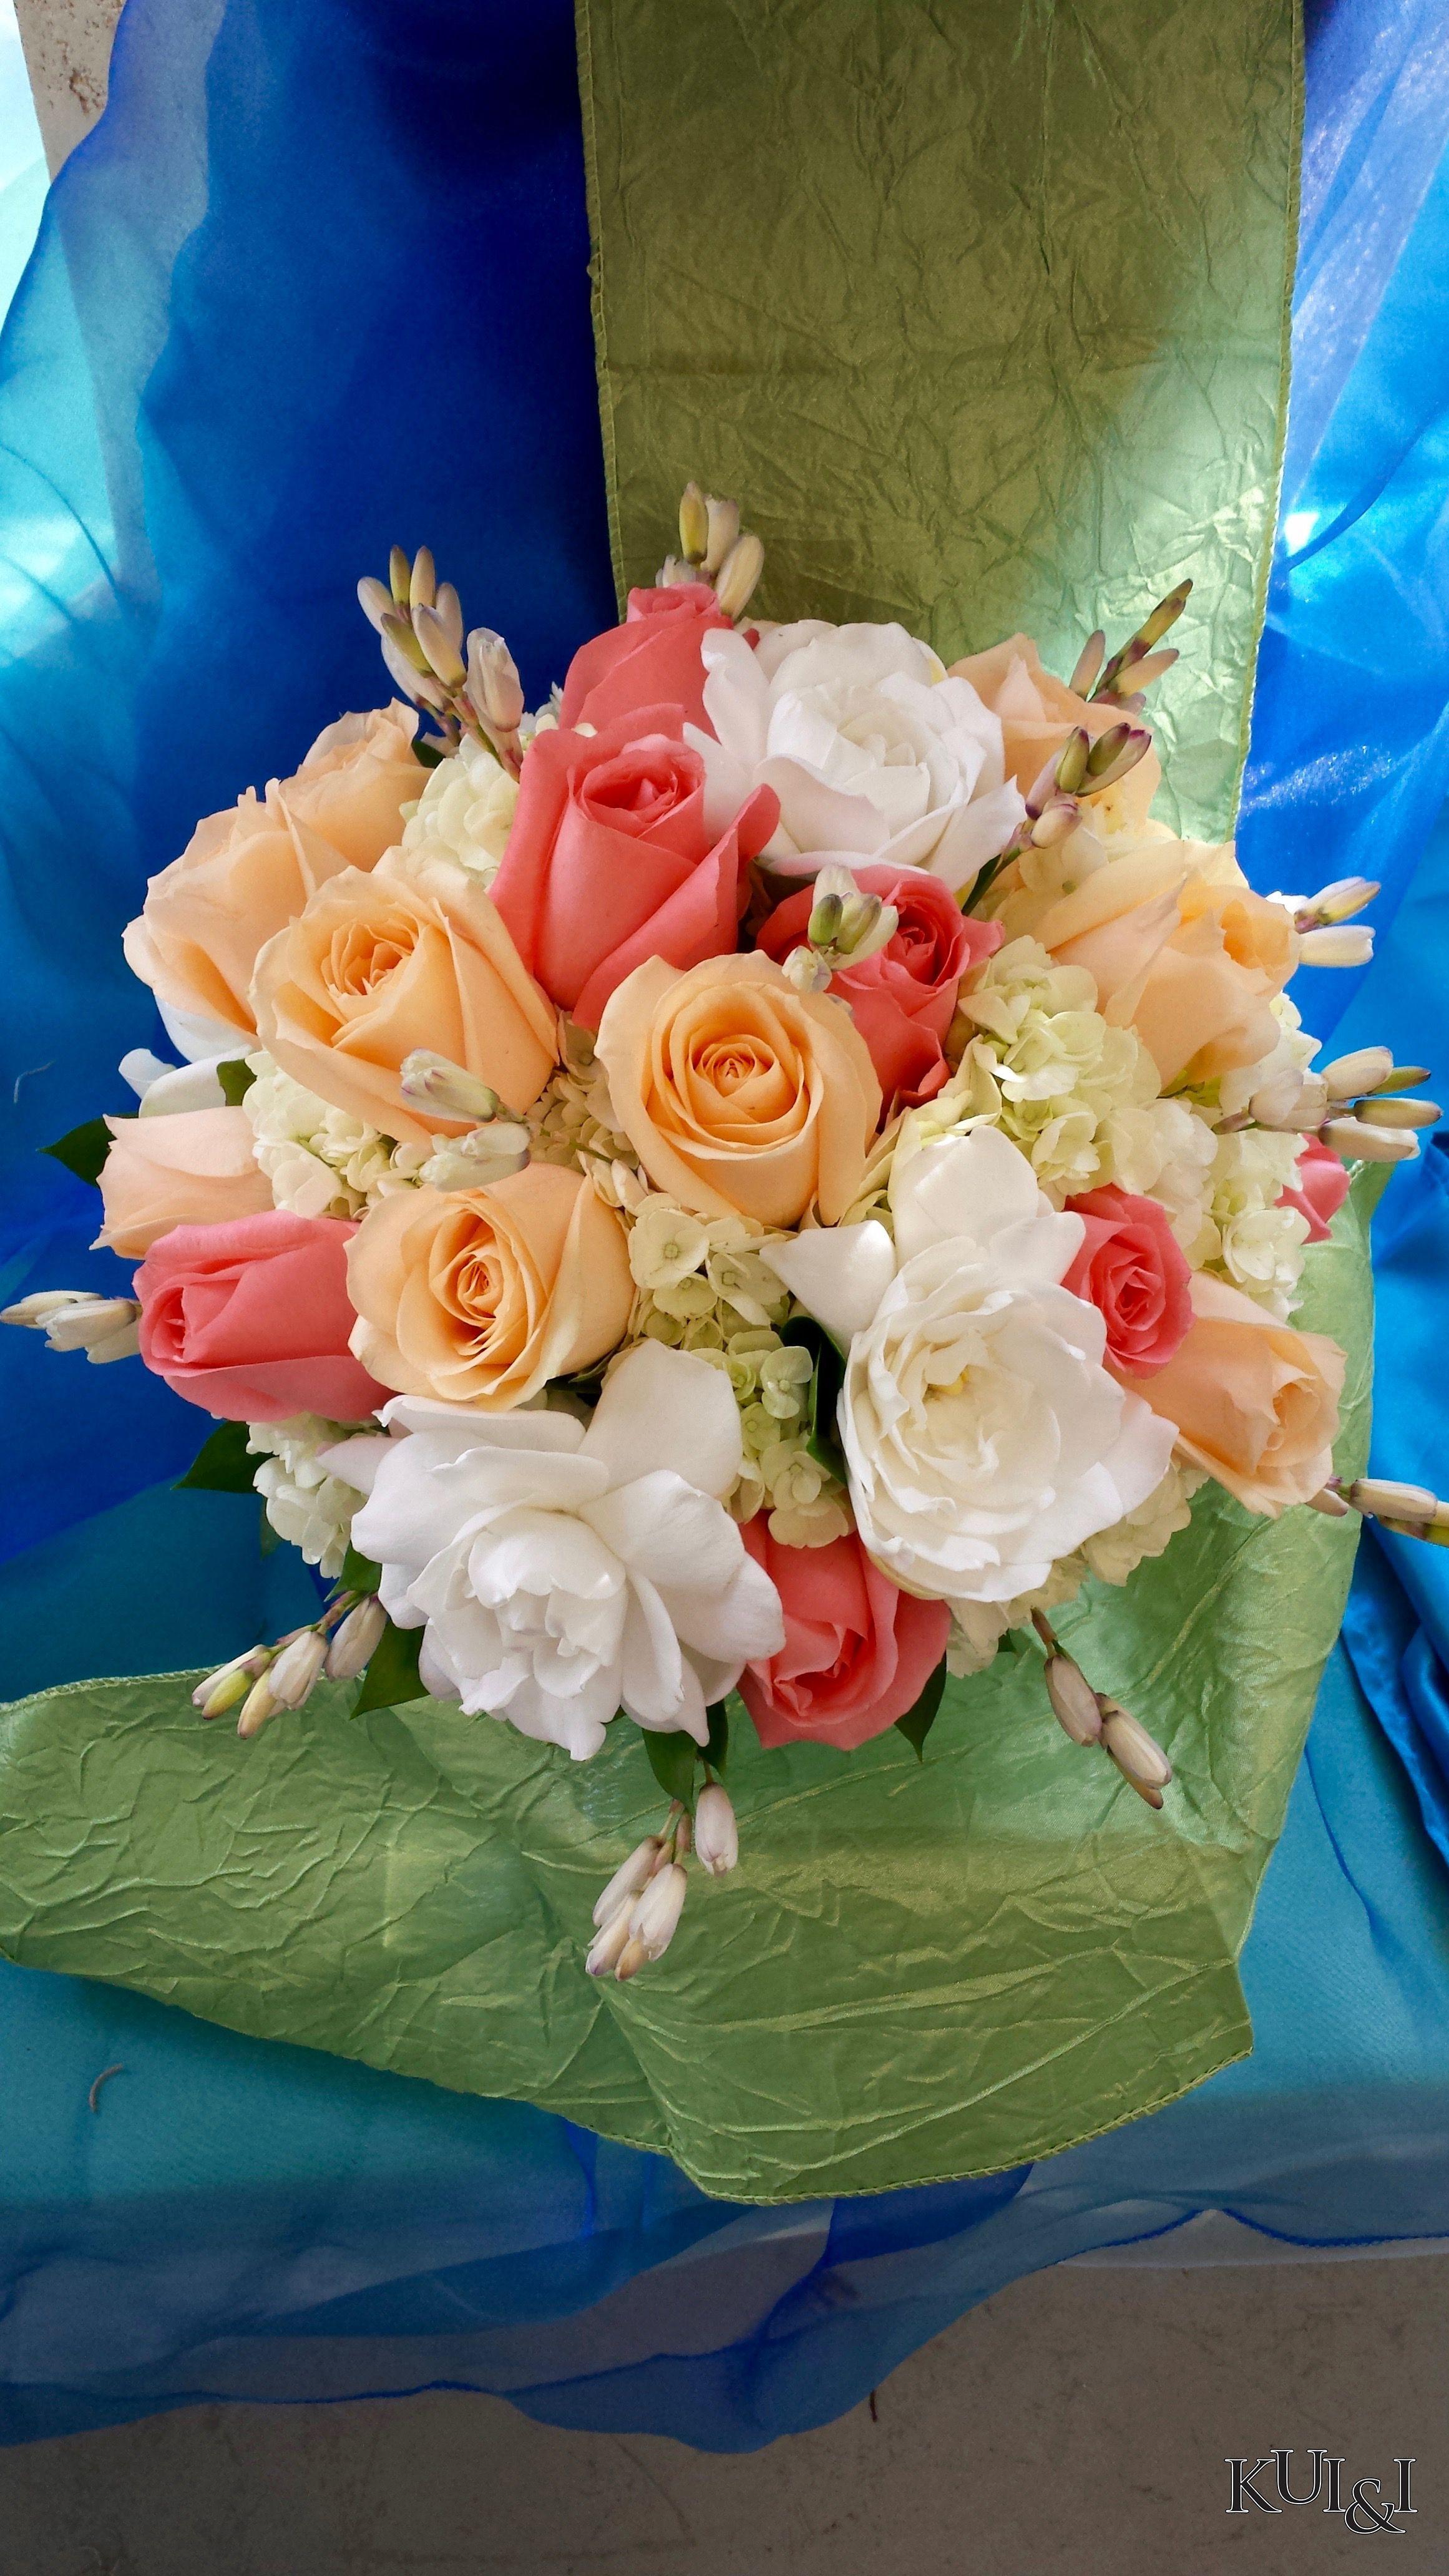 Peach Wedding Bouquet Kui I Florist Llc Hilo Hawaii